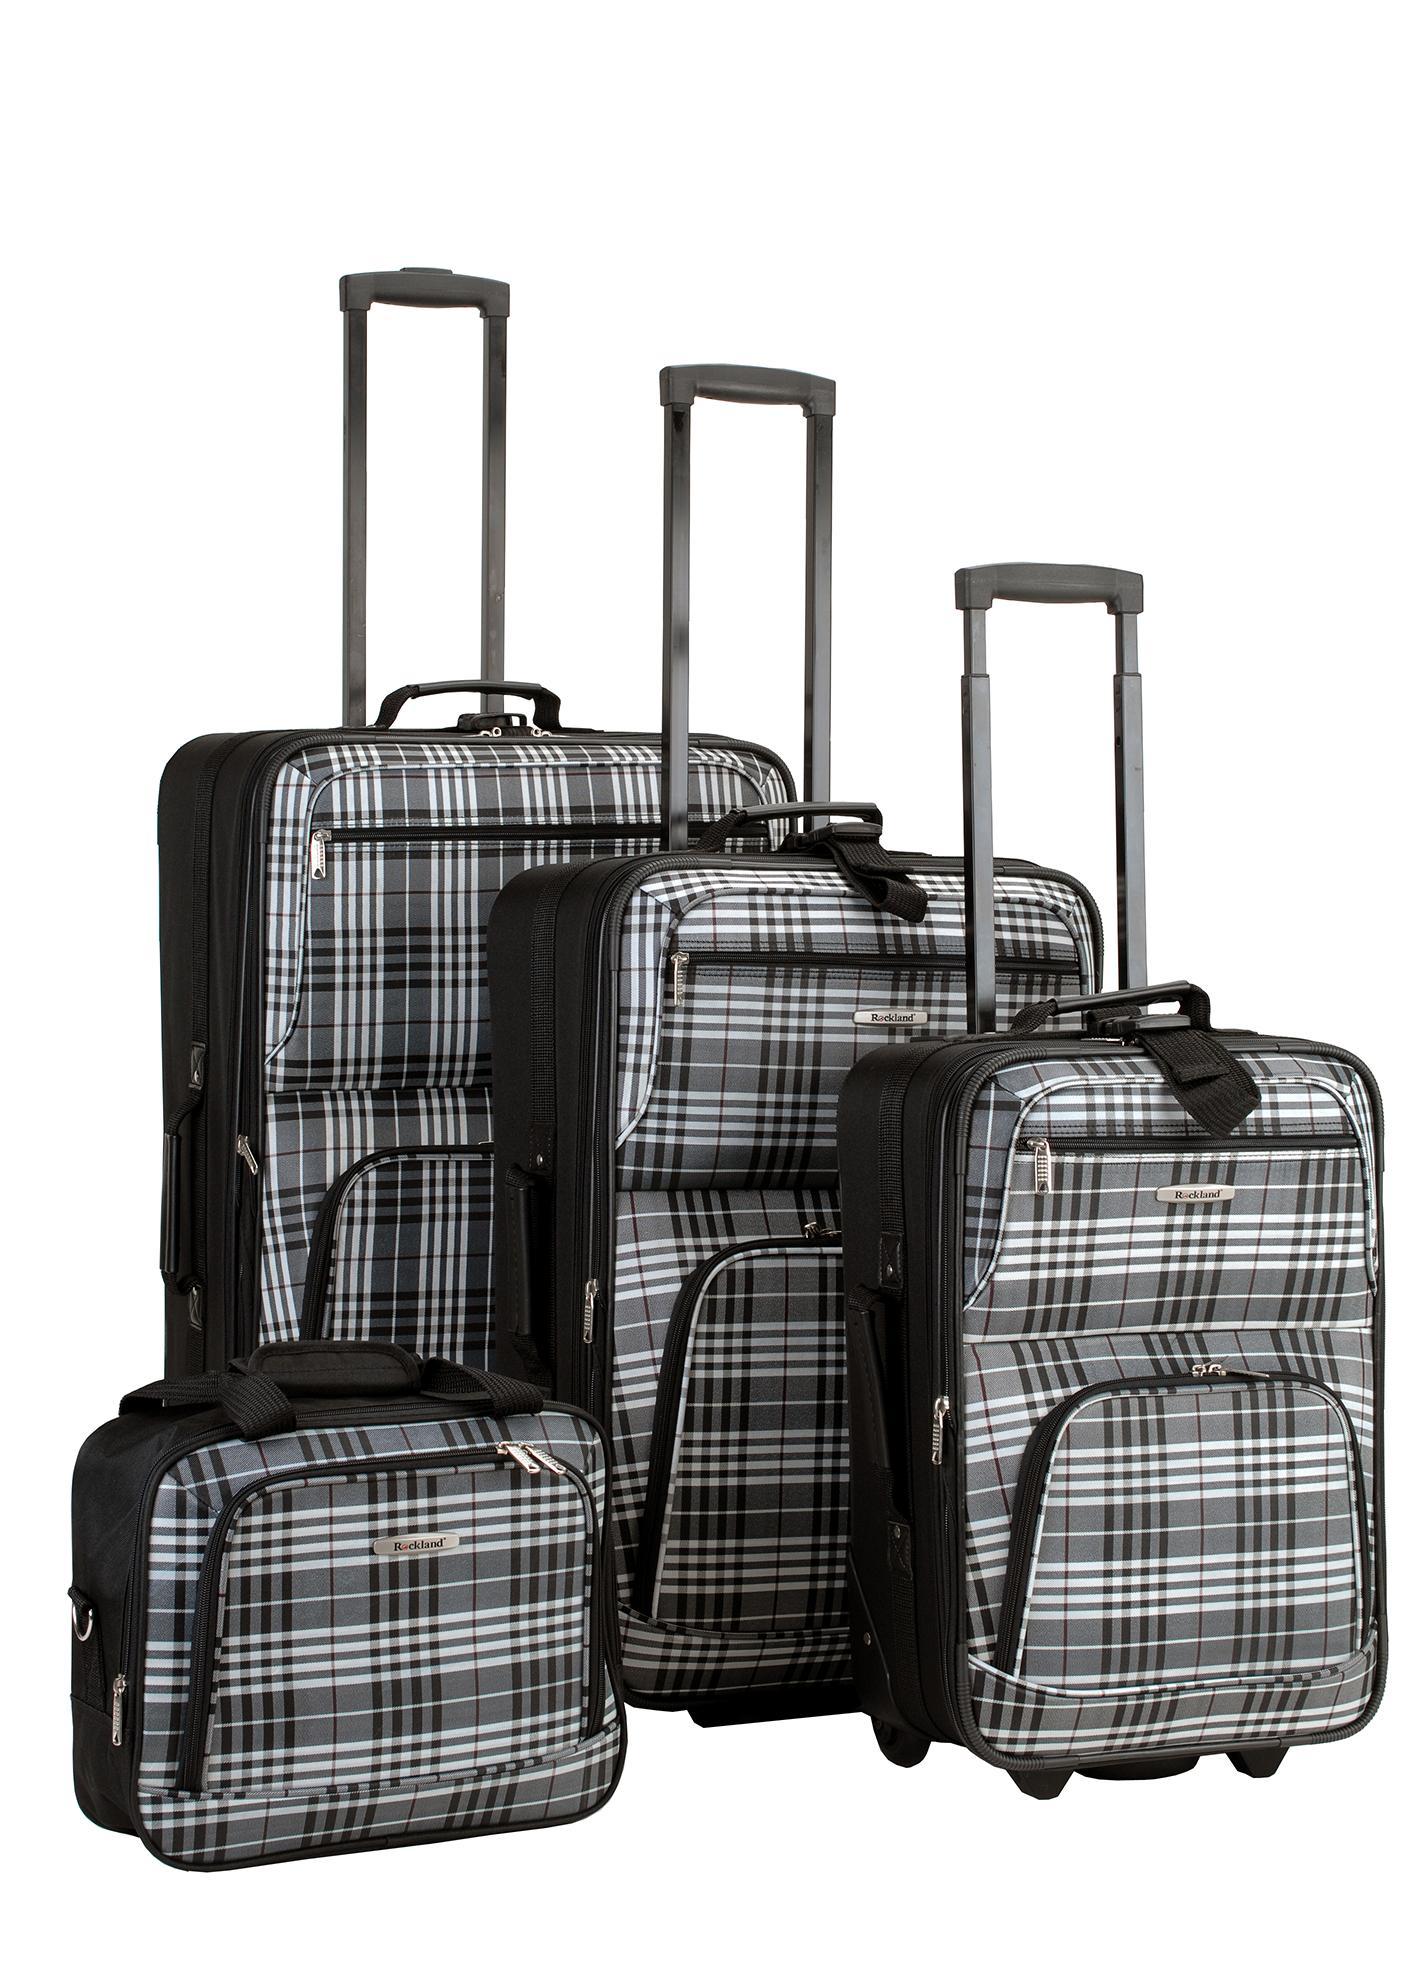 rockland luggage 4 piece luggage set black. Black Bedroom Furniture Sets. Home Design Ideas